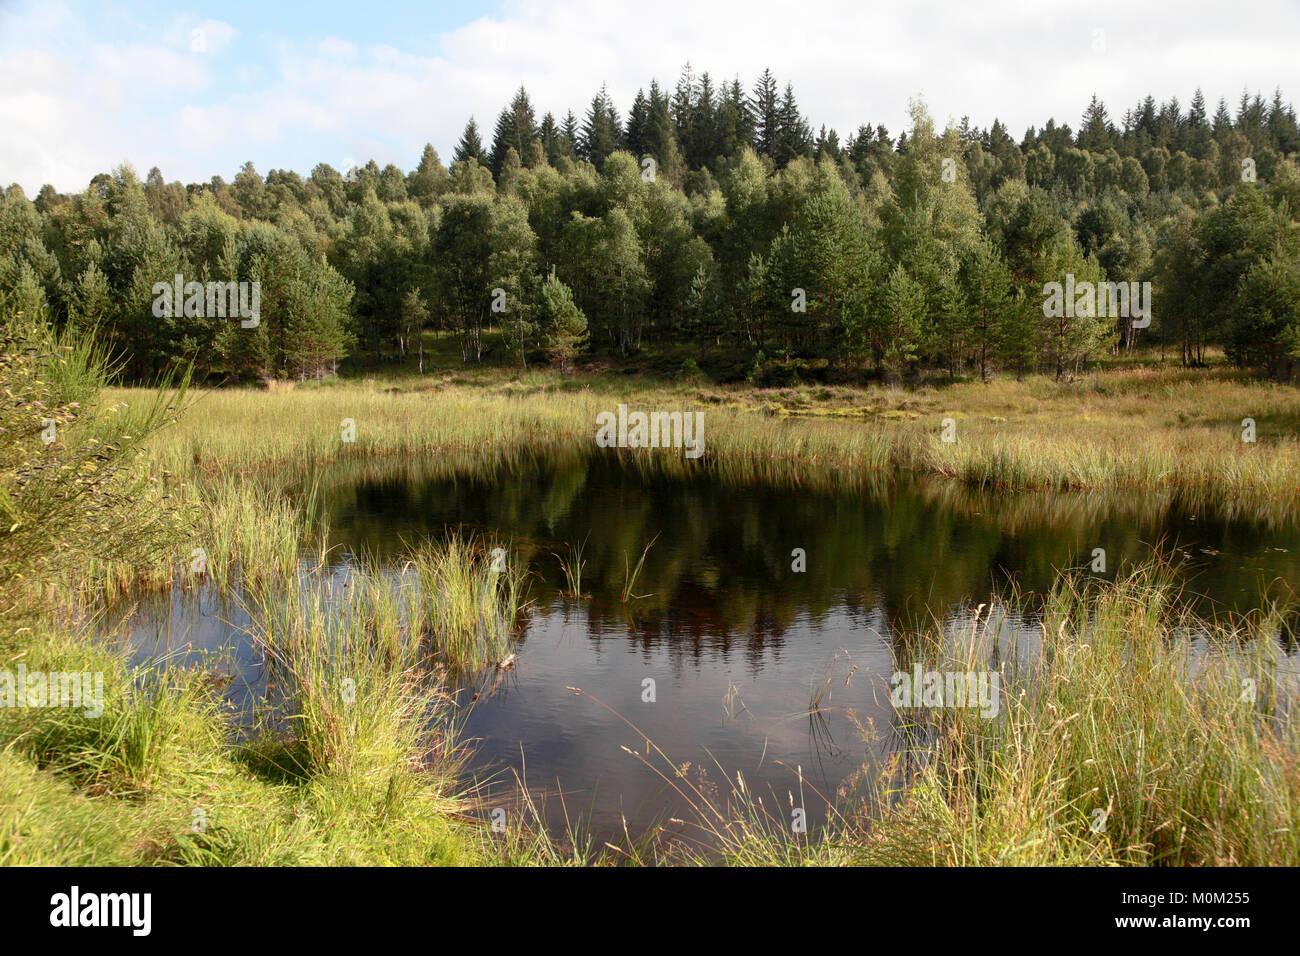 The Fairy Lochan on the Glen Tanar estate near Aboyne, Aberdeenshire, Scotland - Stock Image